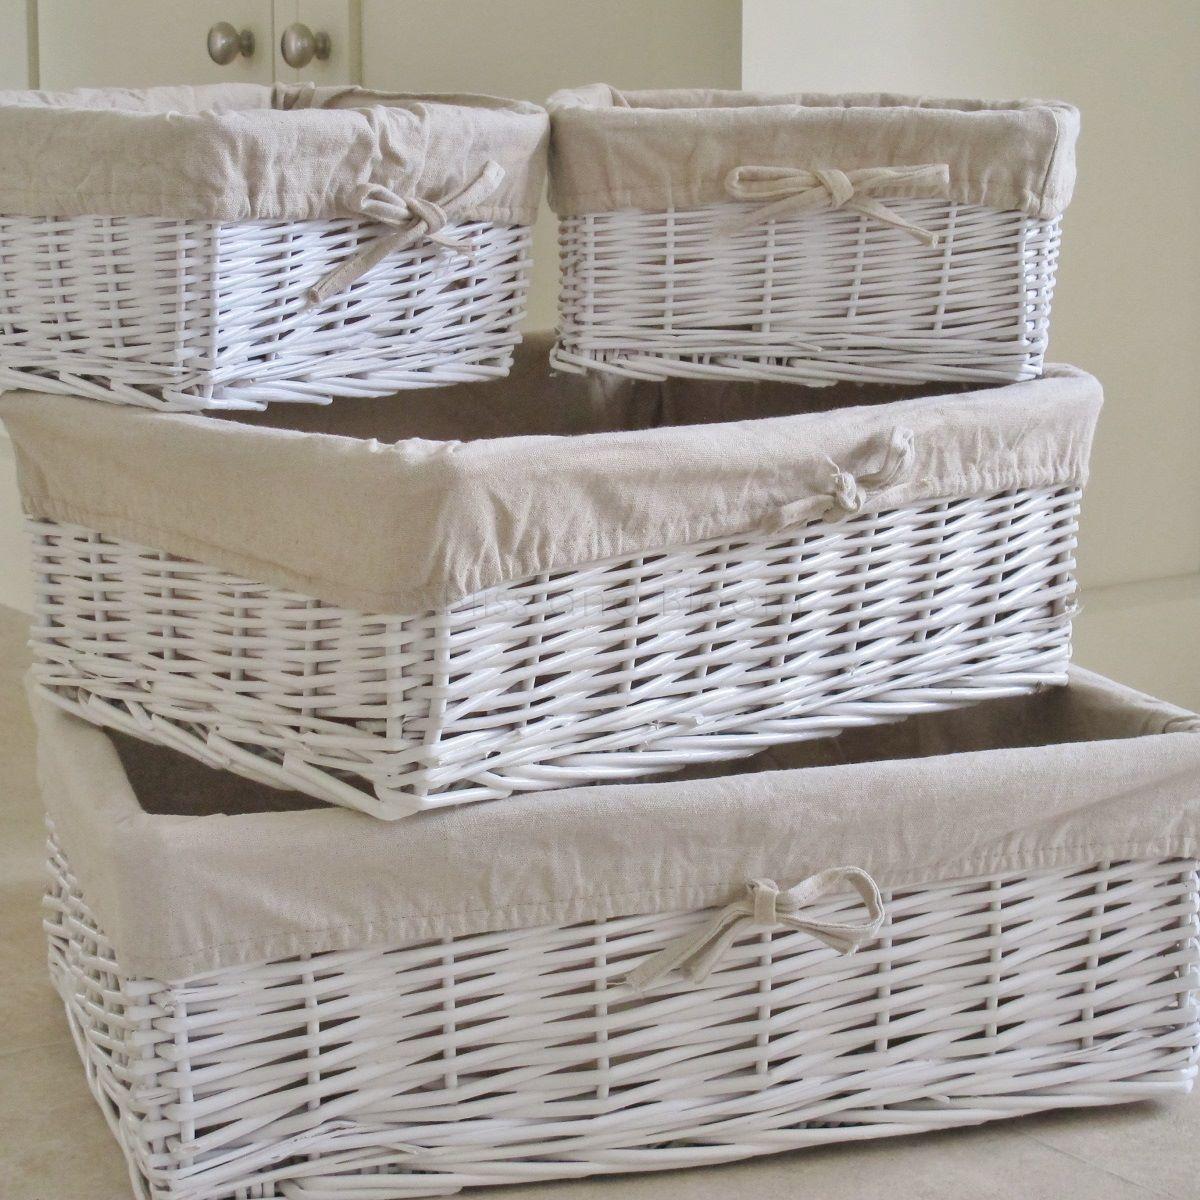 4 white wicker storage baskets bliss and bloom ltd - White wicker bathroom accessories ...